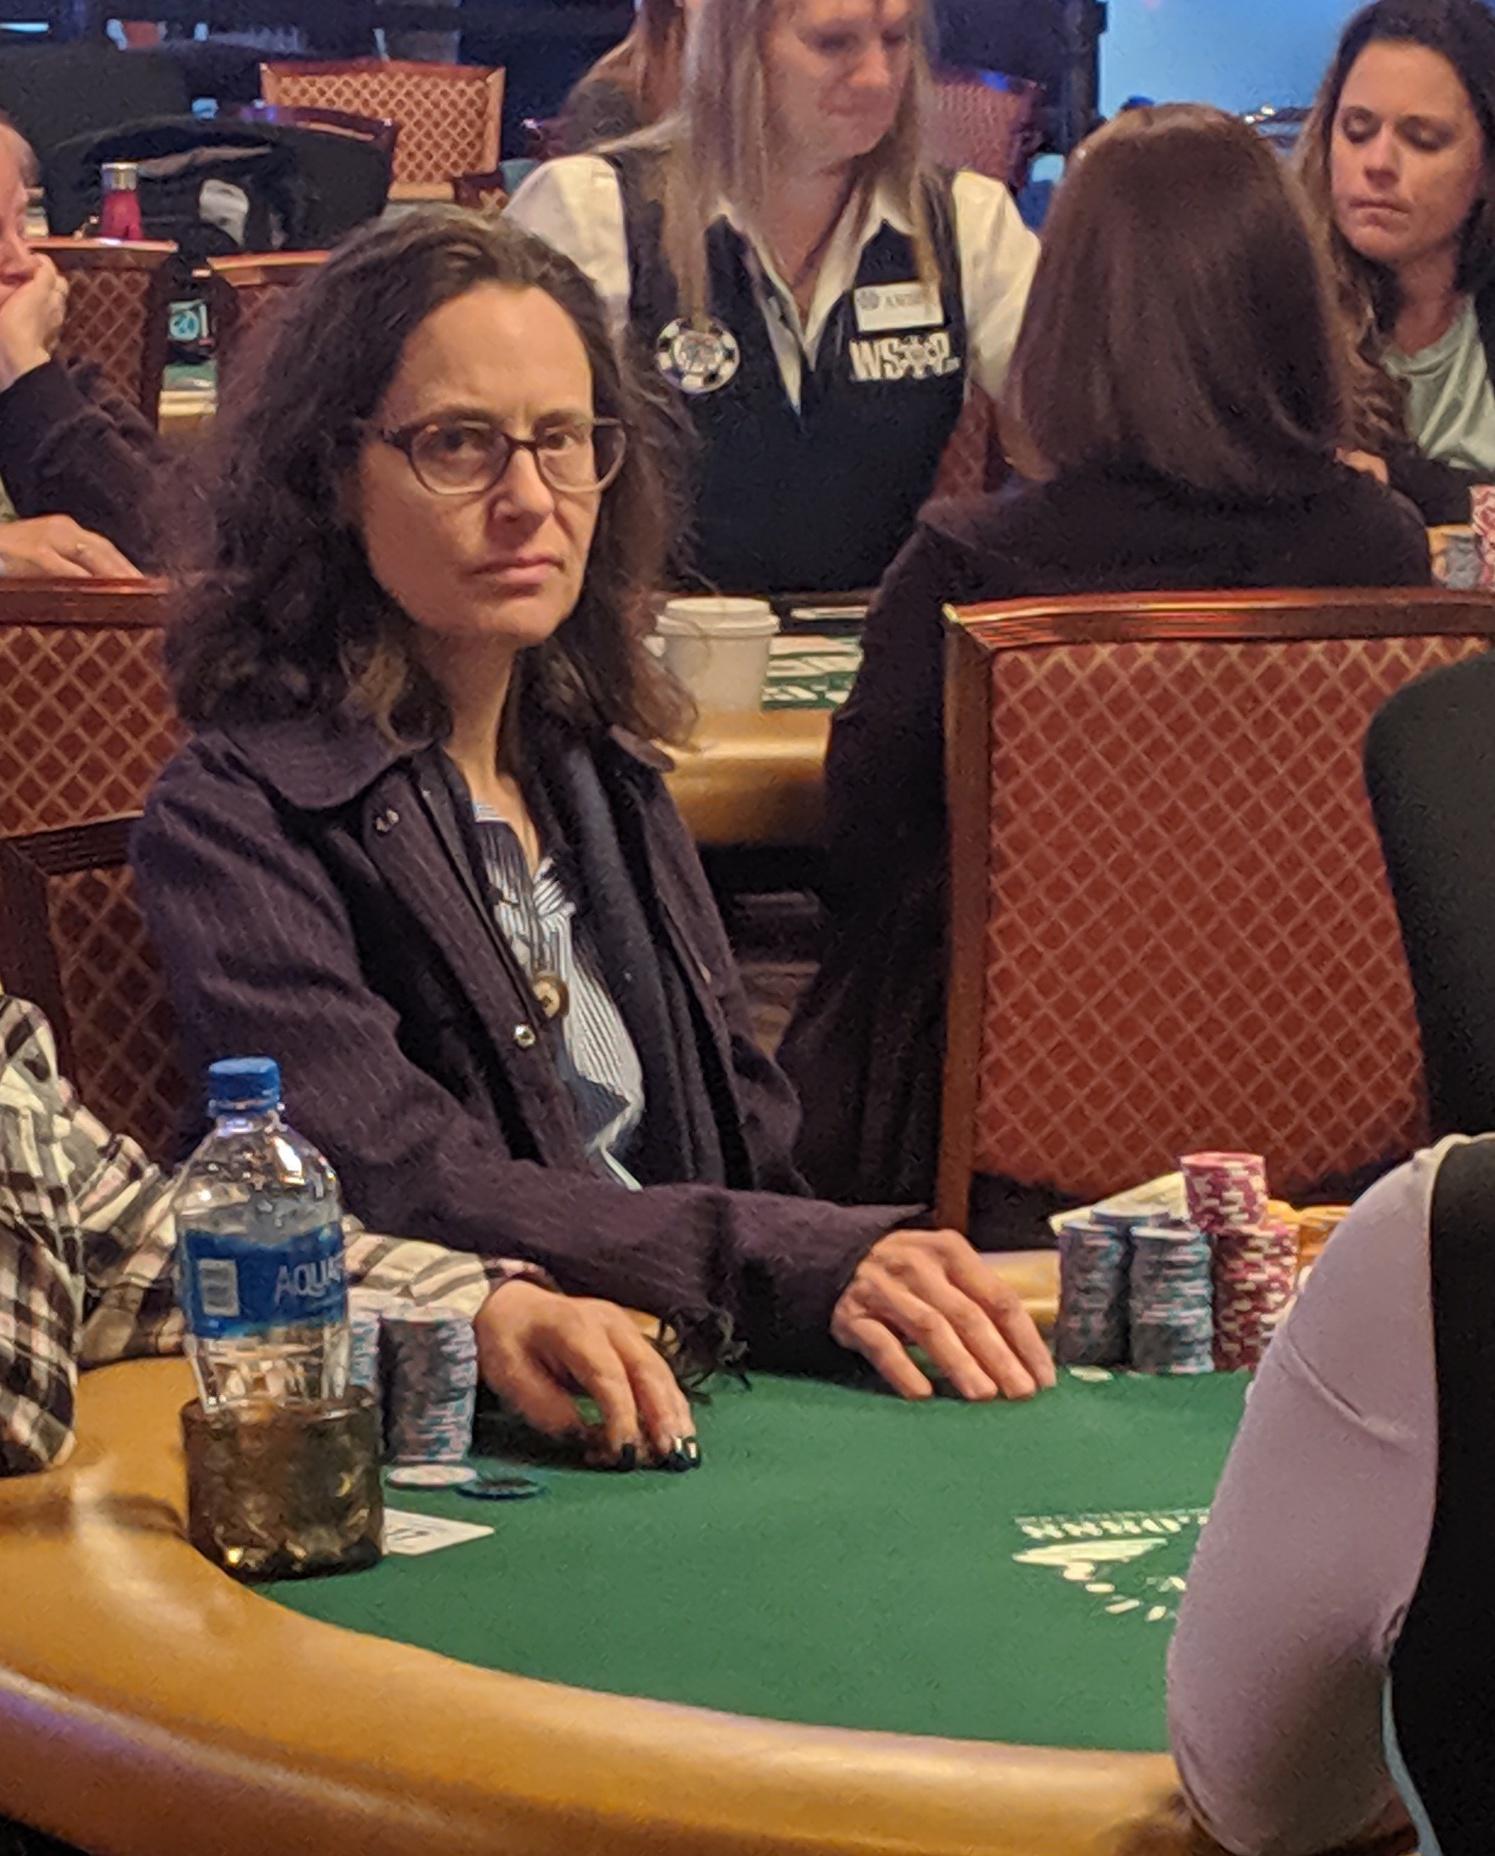 Nancy Matson Semi Pro Poker Player Mcsweeney S Internet Tendency